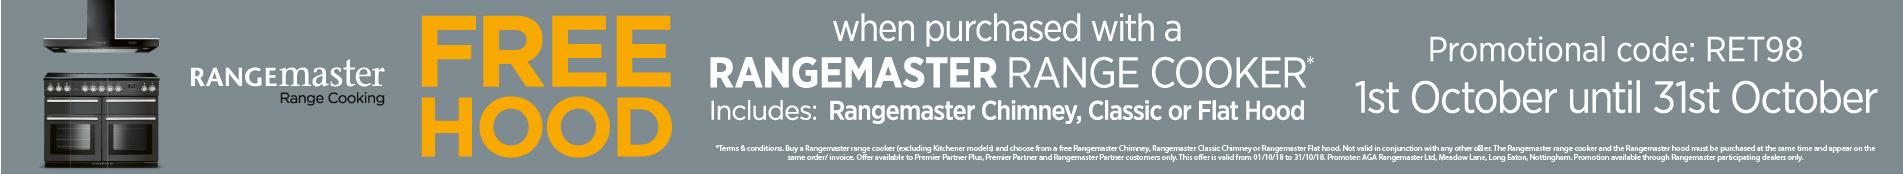 Rangemaster free hood